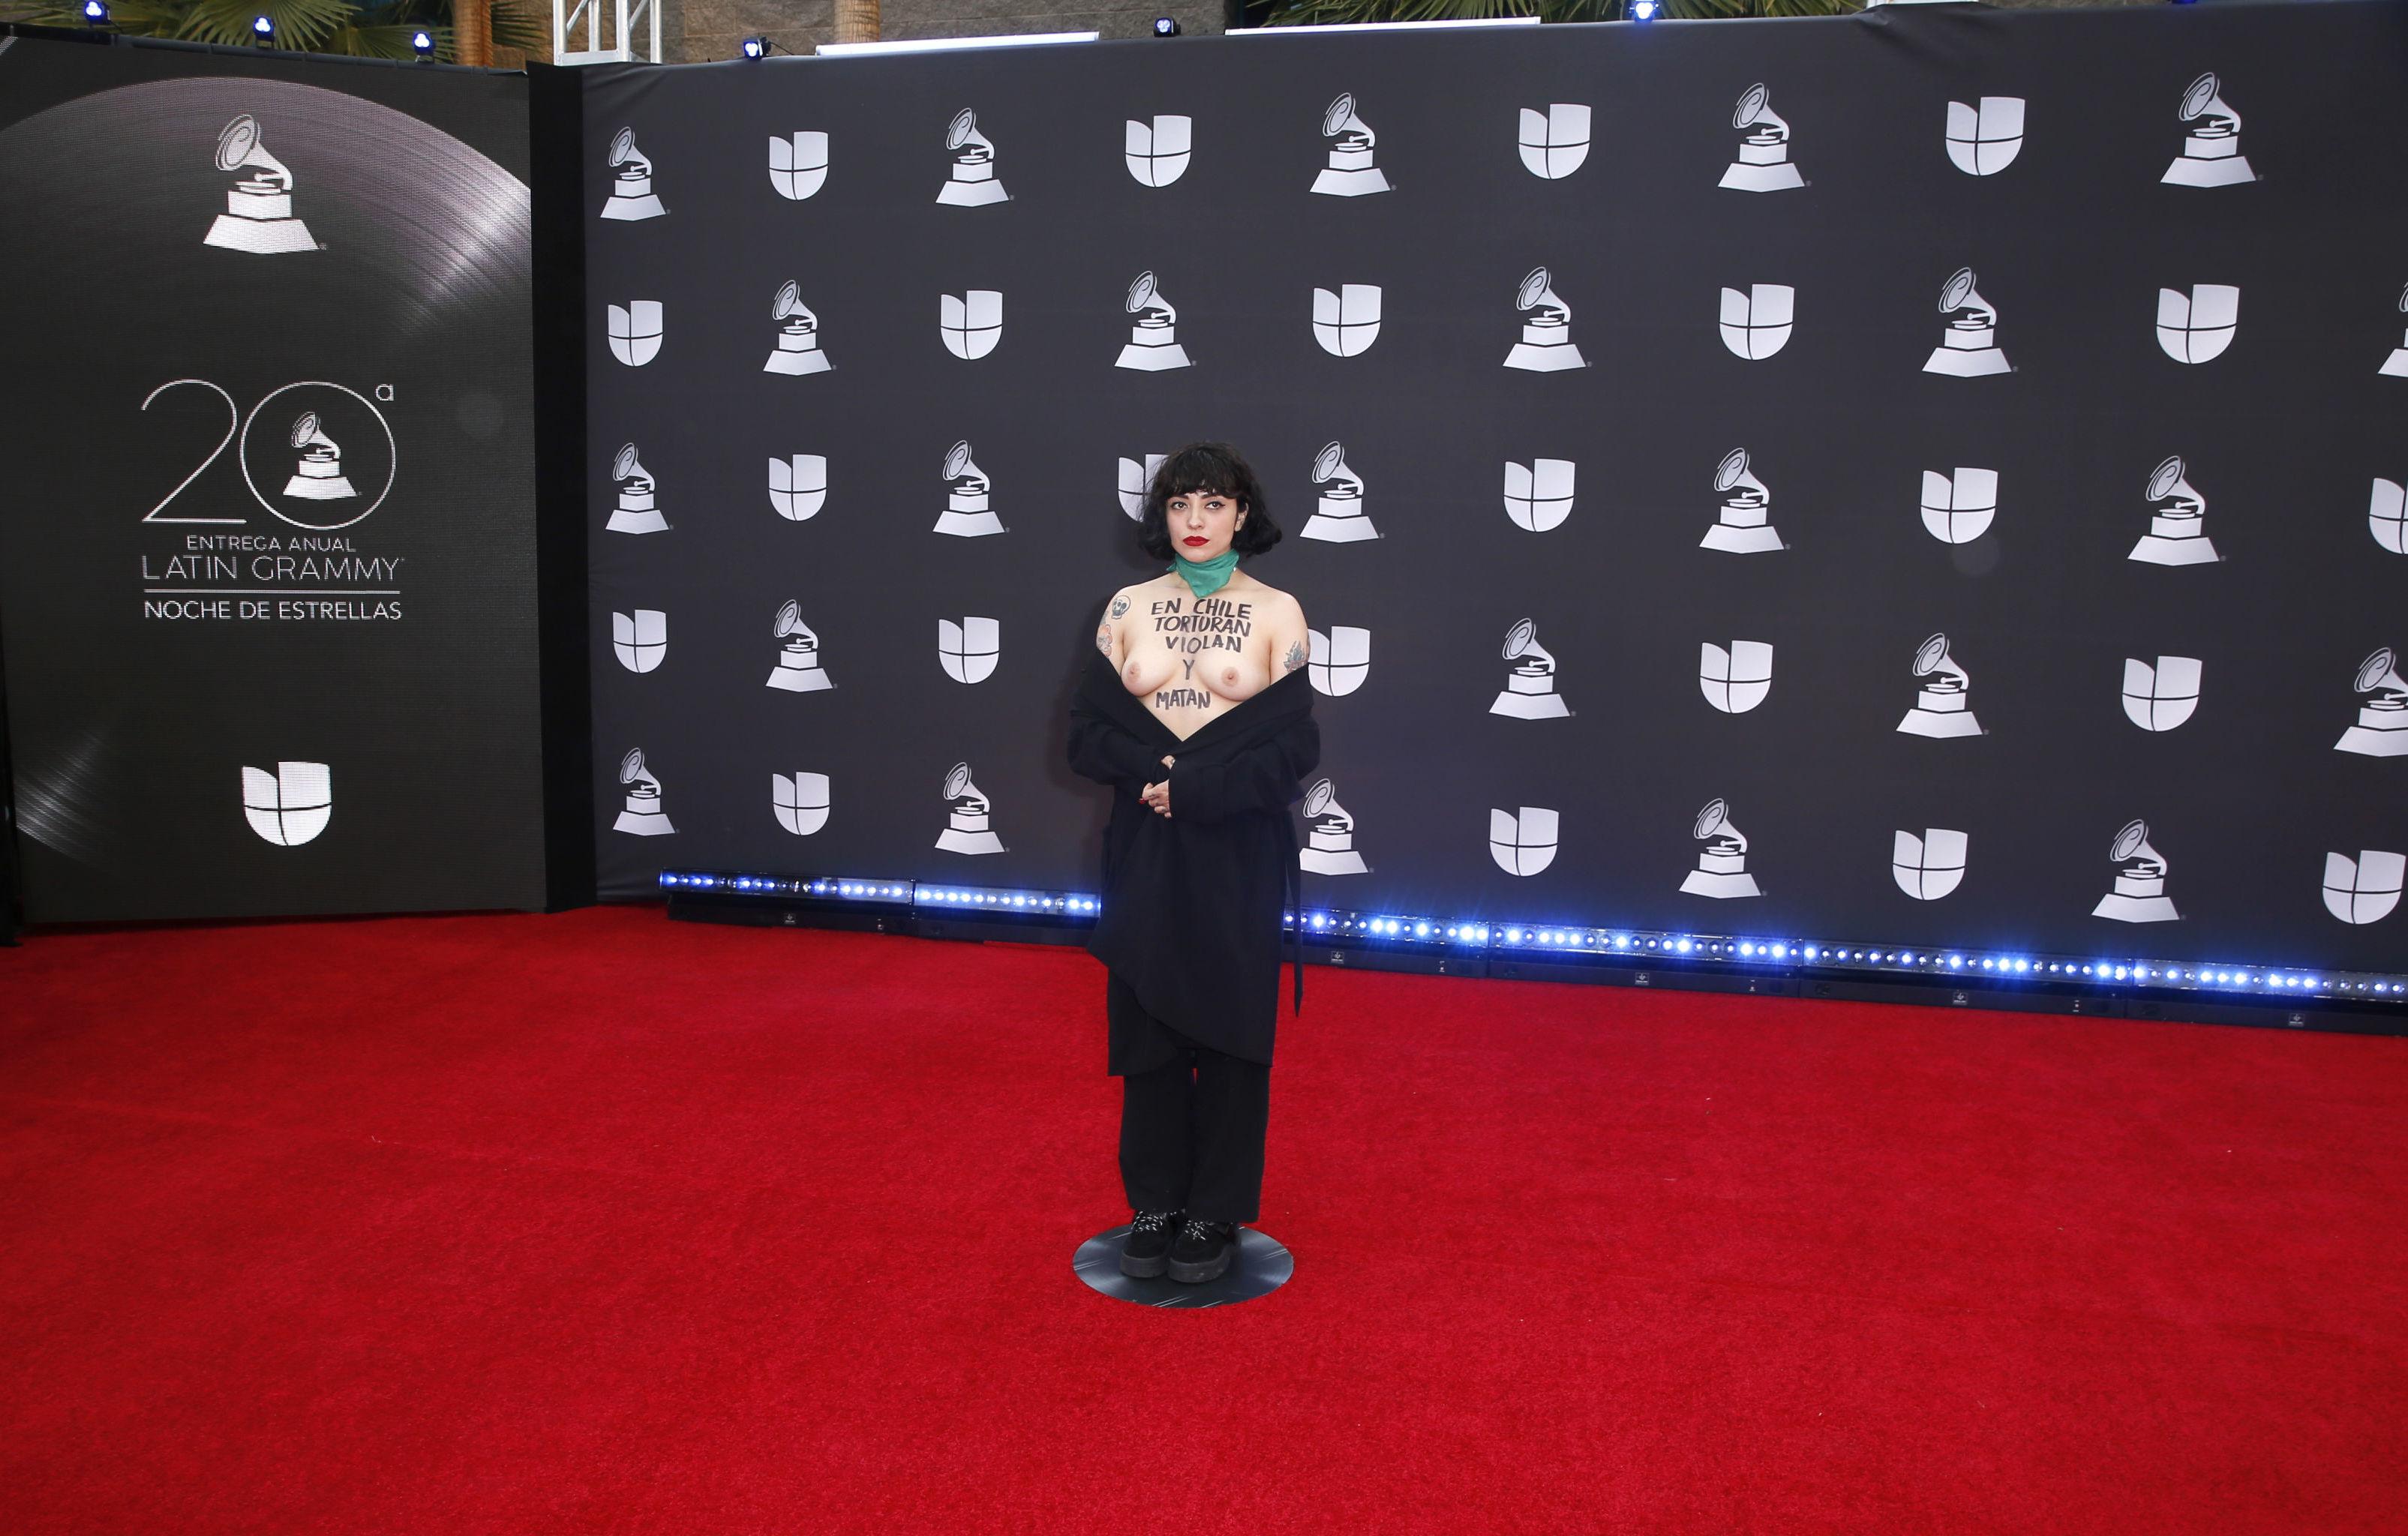 La famosa cantante chilena Mon Laferte deja sus senos al descubierto en los Latin Grammy